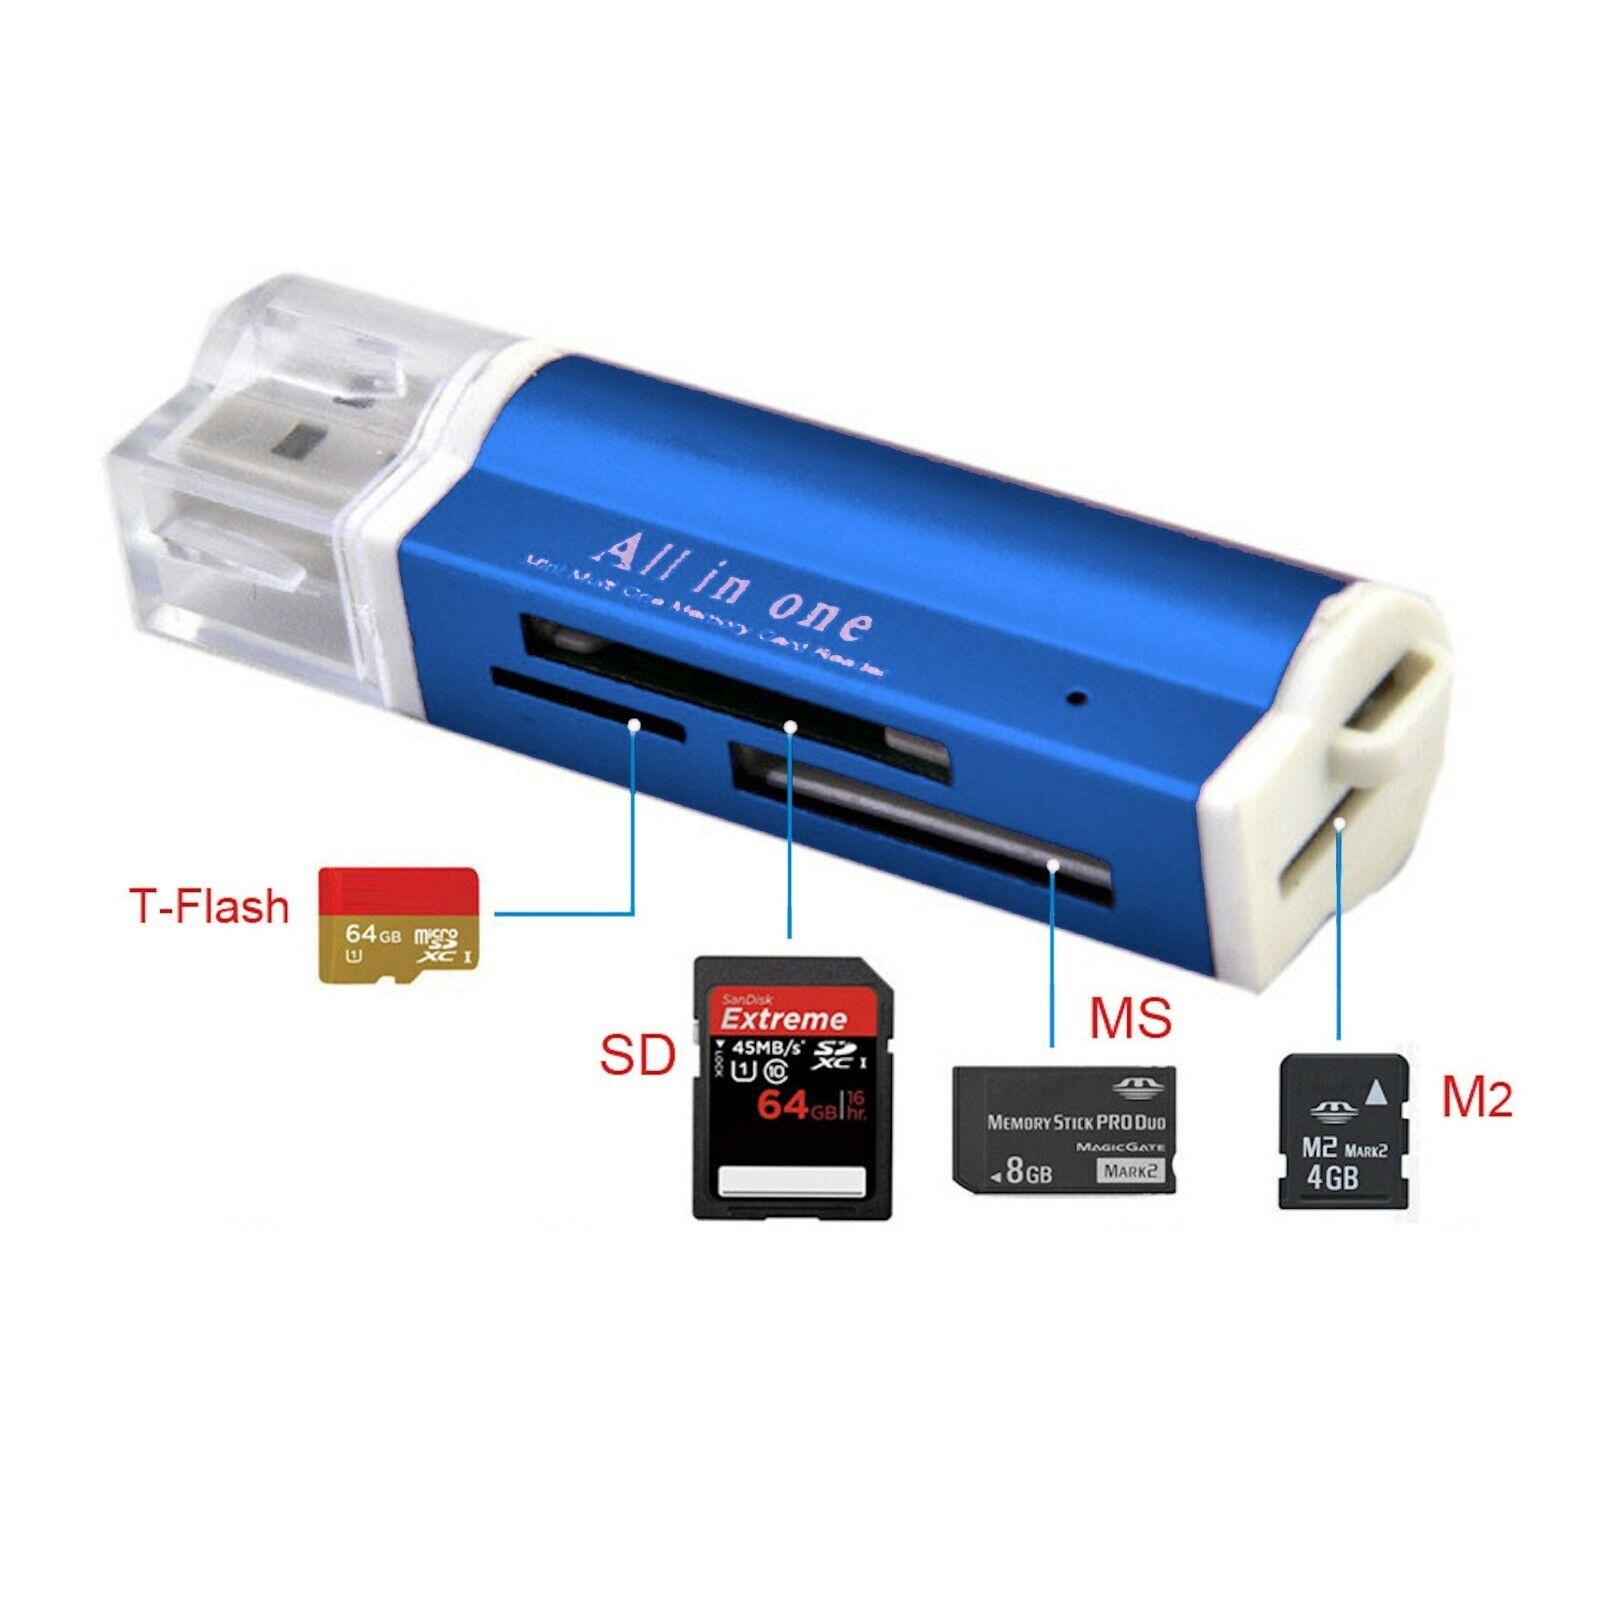 Neu USB2.0 Kartenadapter Kartenleser SD TF CF XD MS MMC Speicherkartenleser